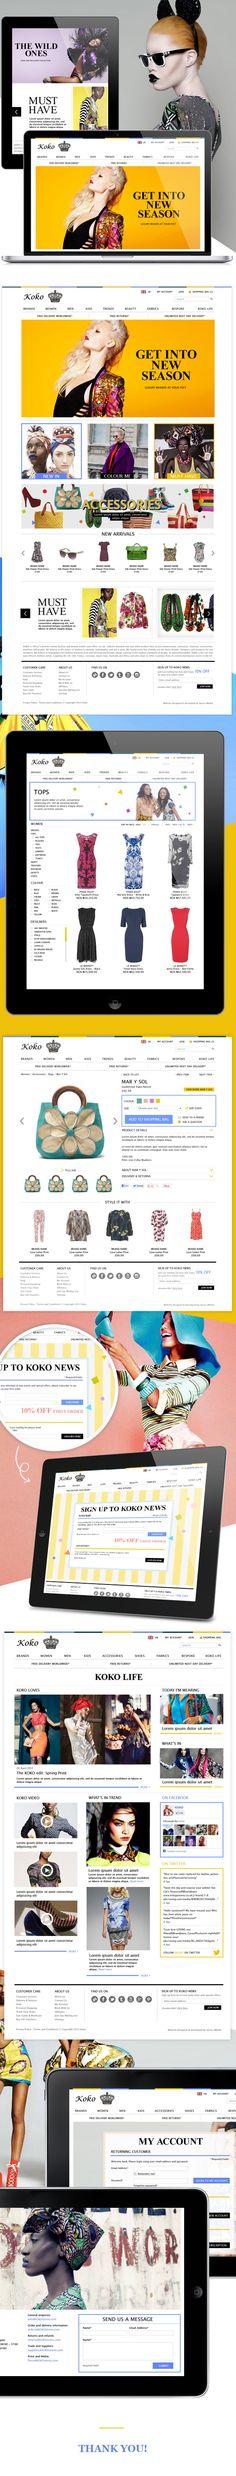 Koko stores E-commerce design by Ge Song, via Behance